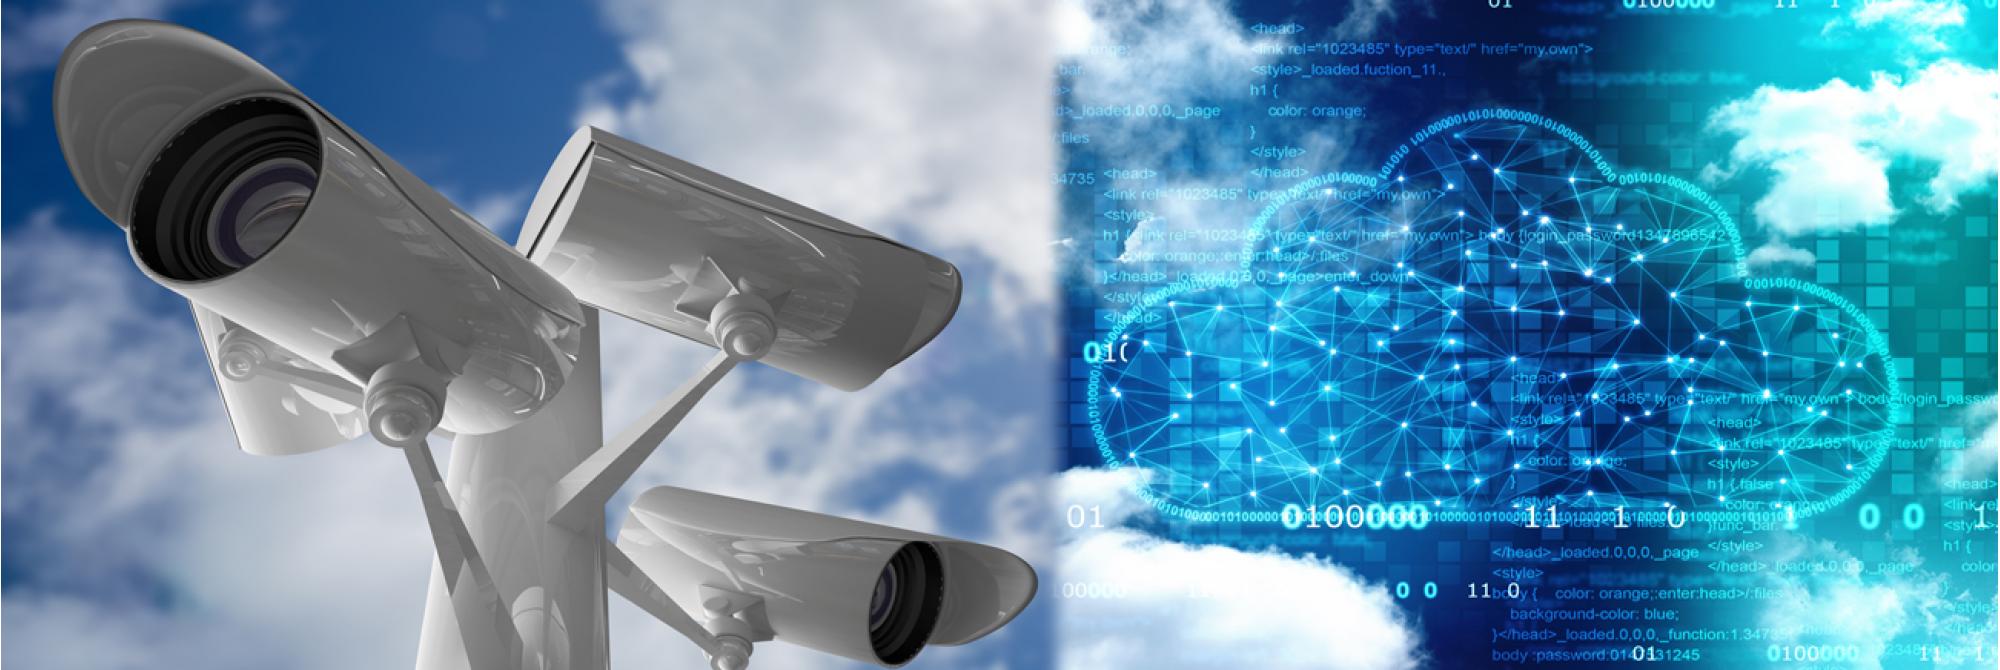 Visec Surveillance Software for IP and analog cameras